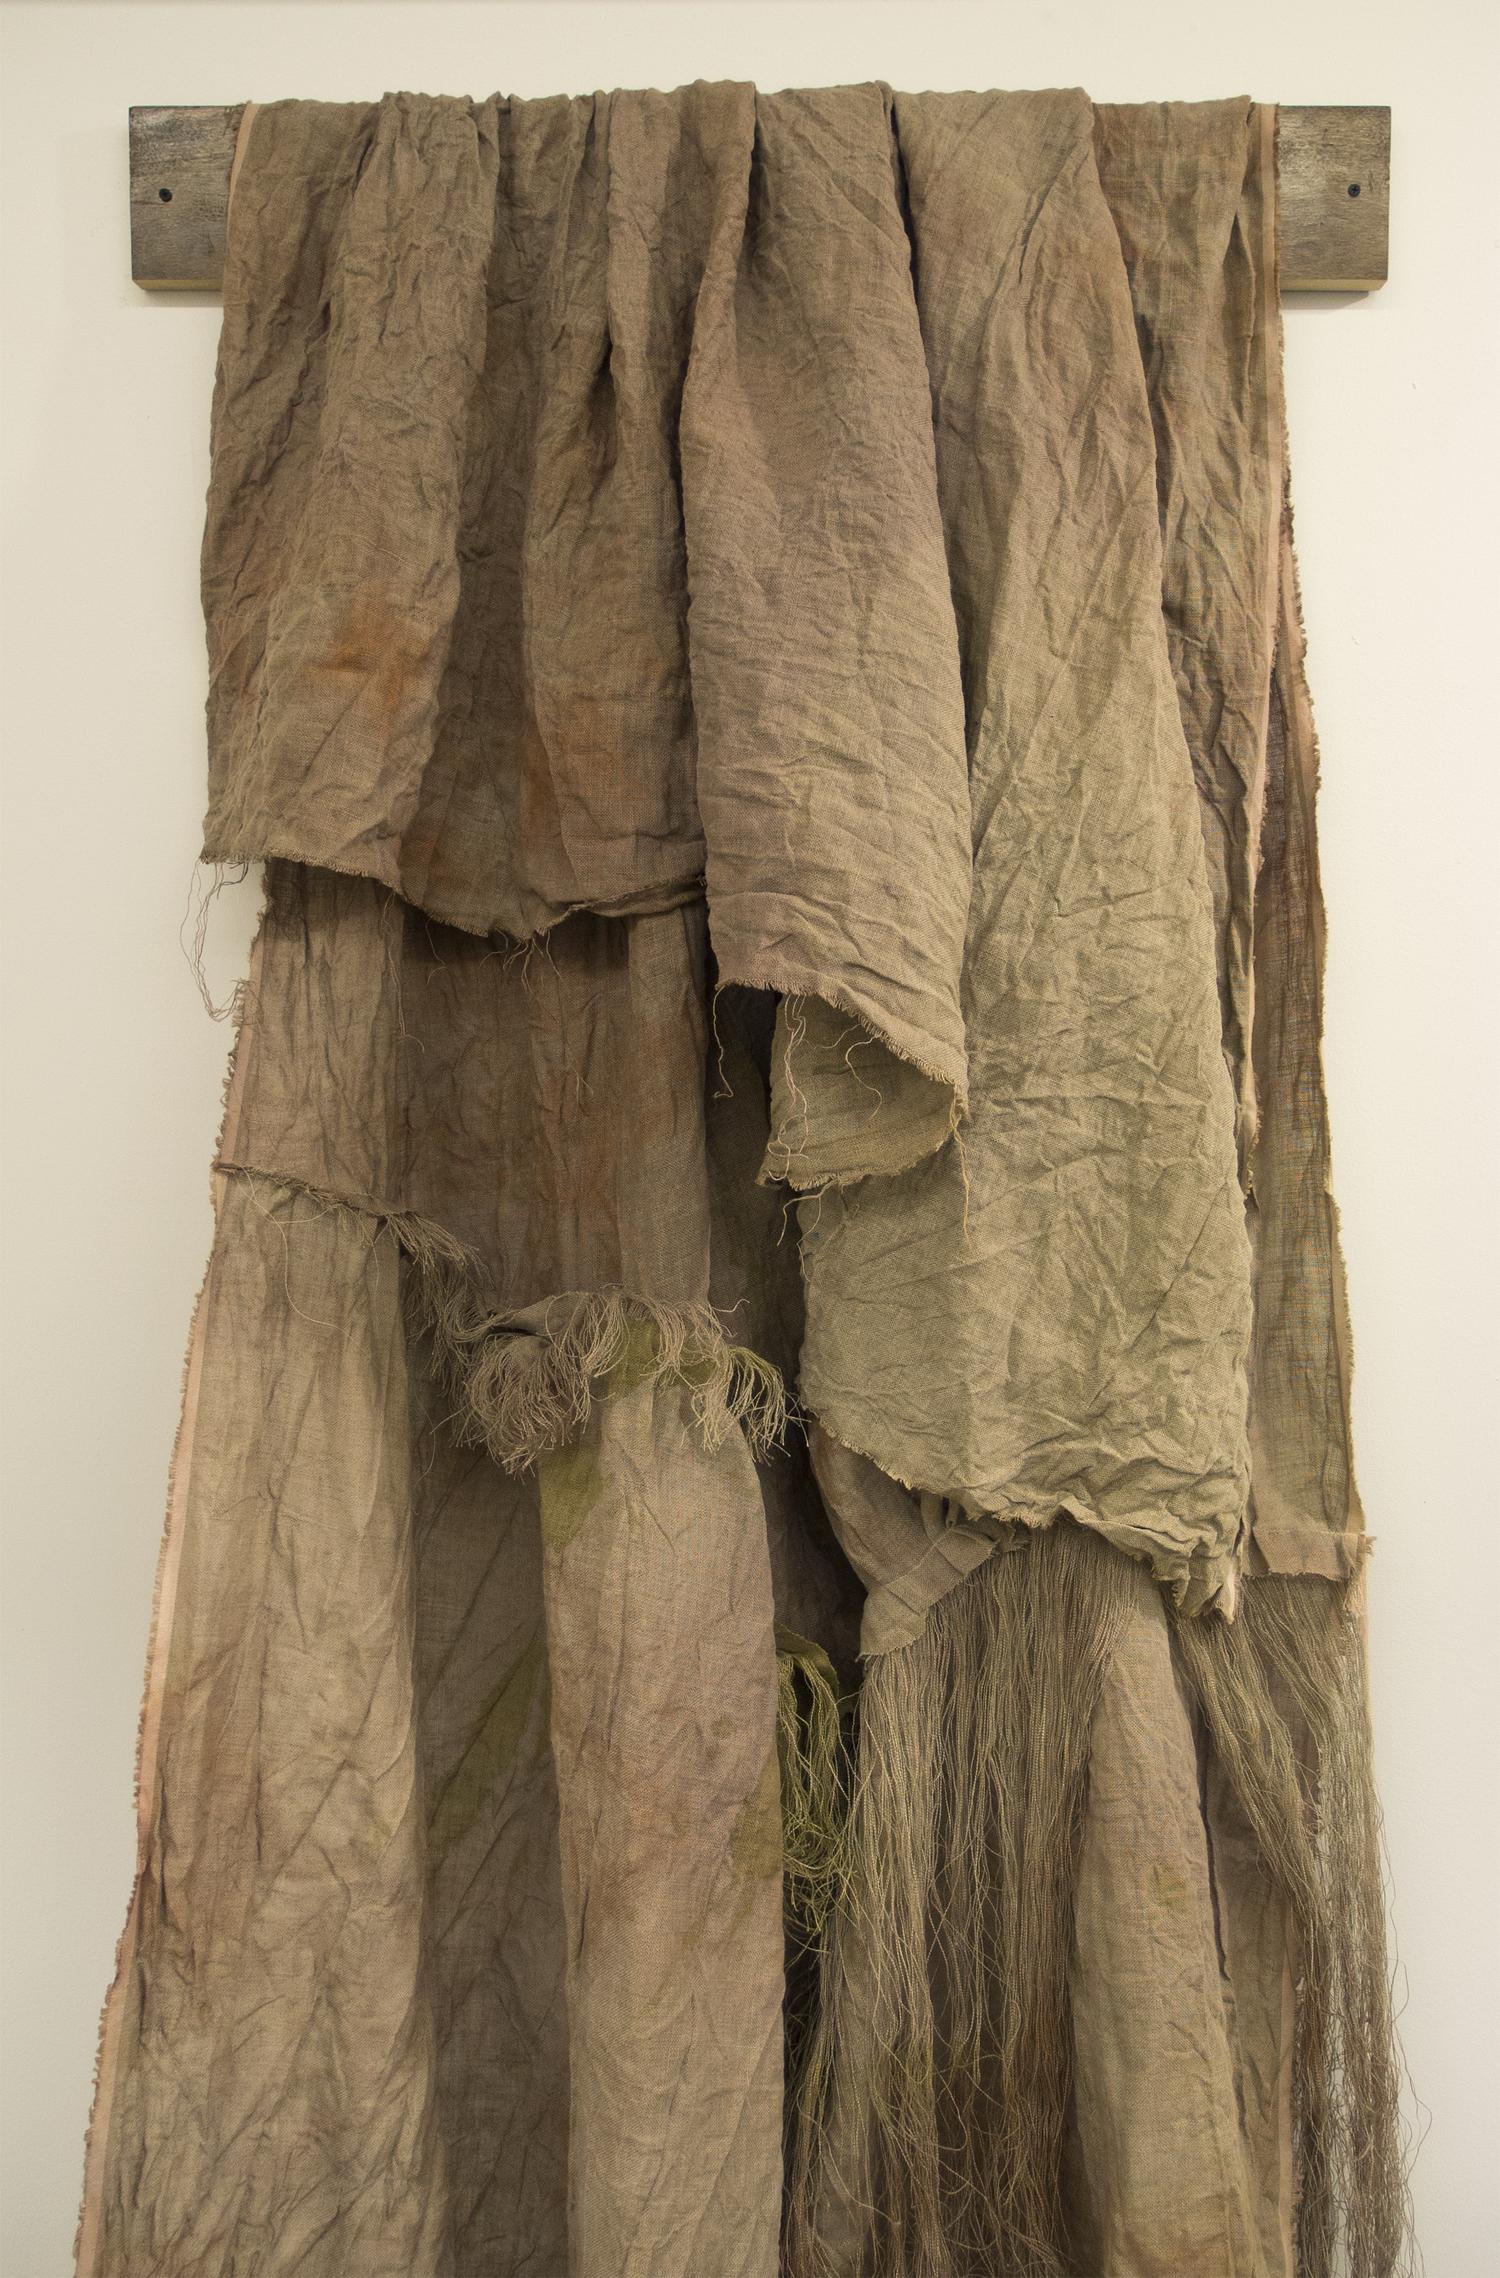 (untitled)  [detail] 2012 fabric dye, acrylic, gouache, watercolor, thread on linen